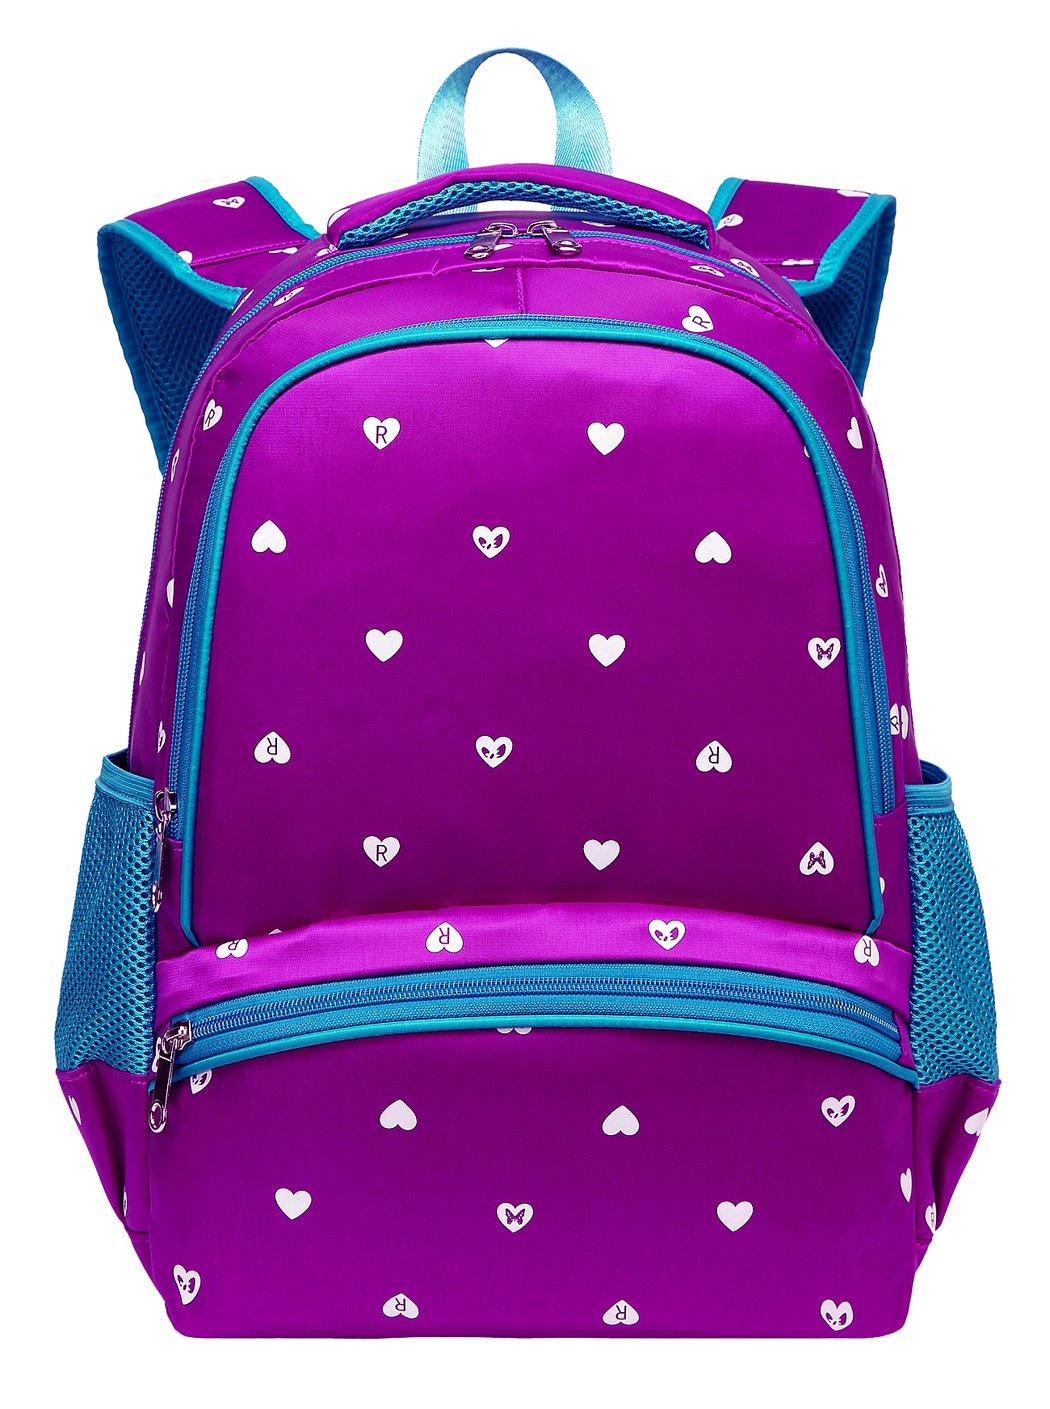 Amazon.com  BLUEFAIRY Girls Backpacks for Kindergarten Kids Girly School  Bags Durable Bookbags for Little Girls 15 Inch Nylon Heart Print (Small ... 8a10b55028c5f